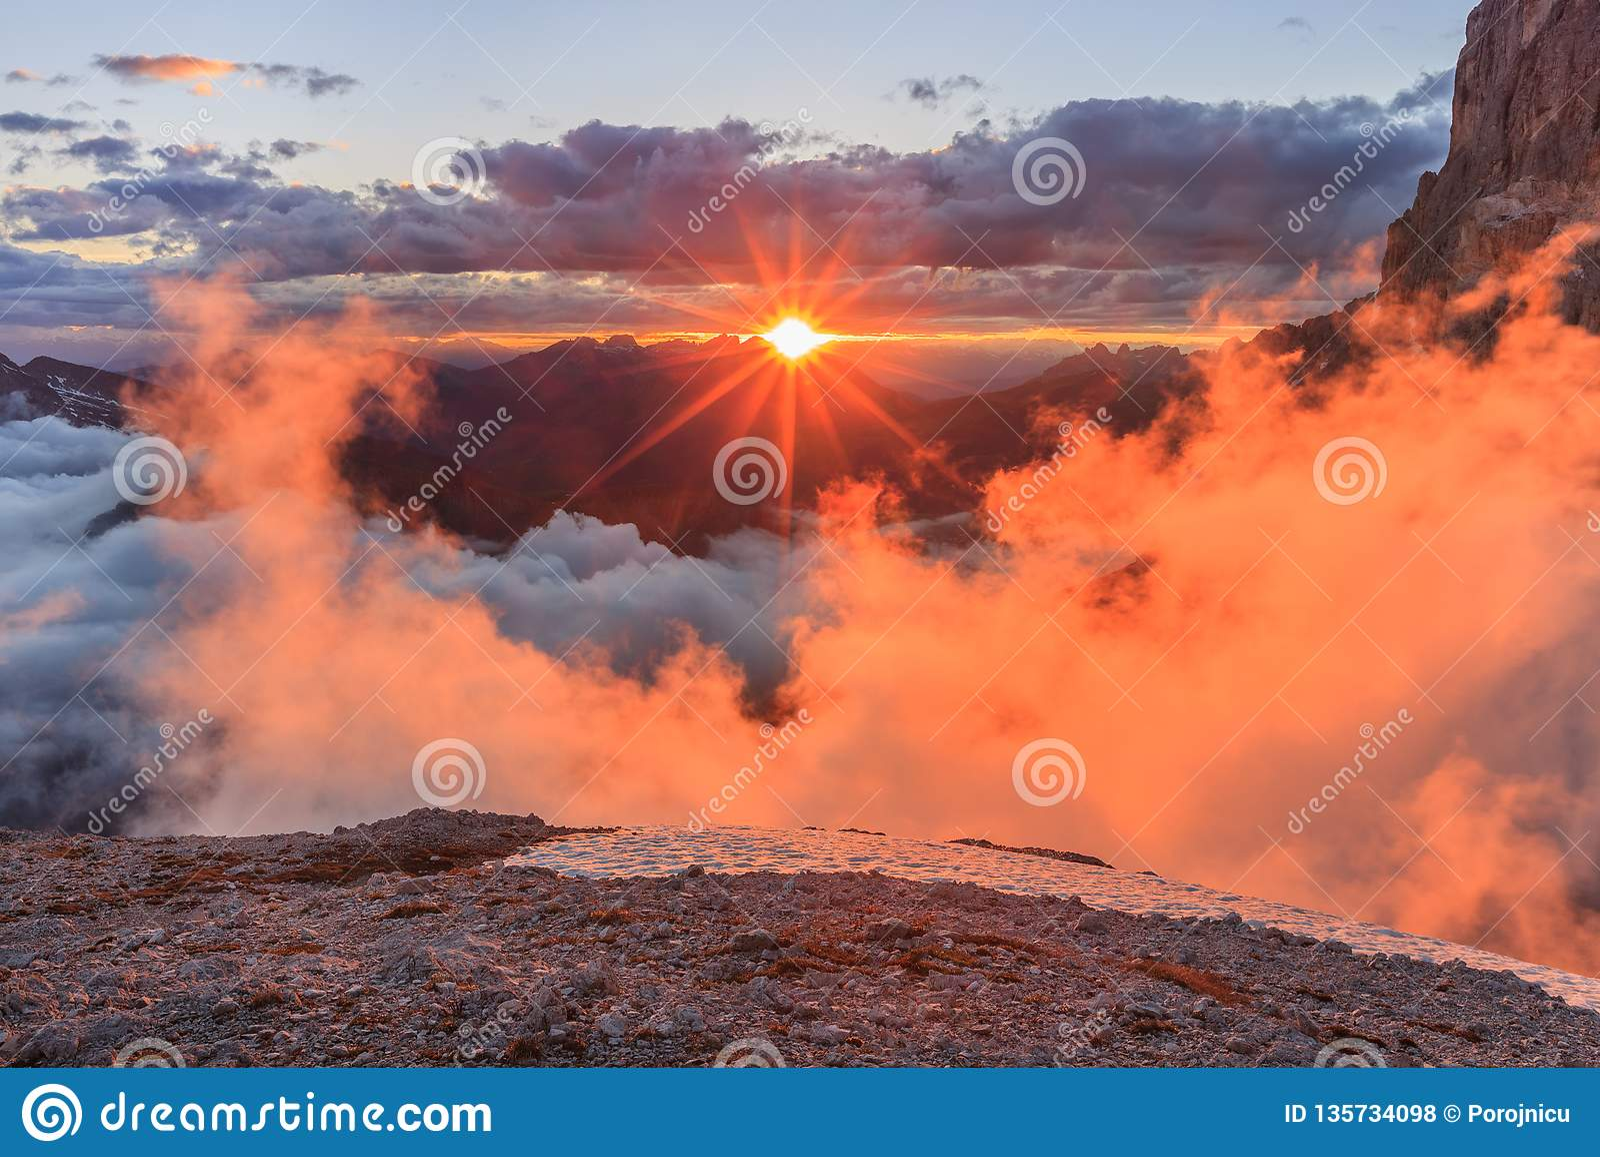 Zonsondergang in Dolomietalpen, Italië